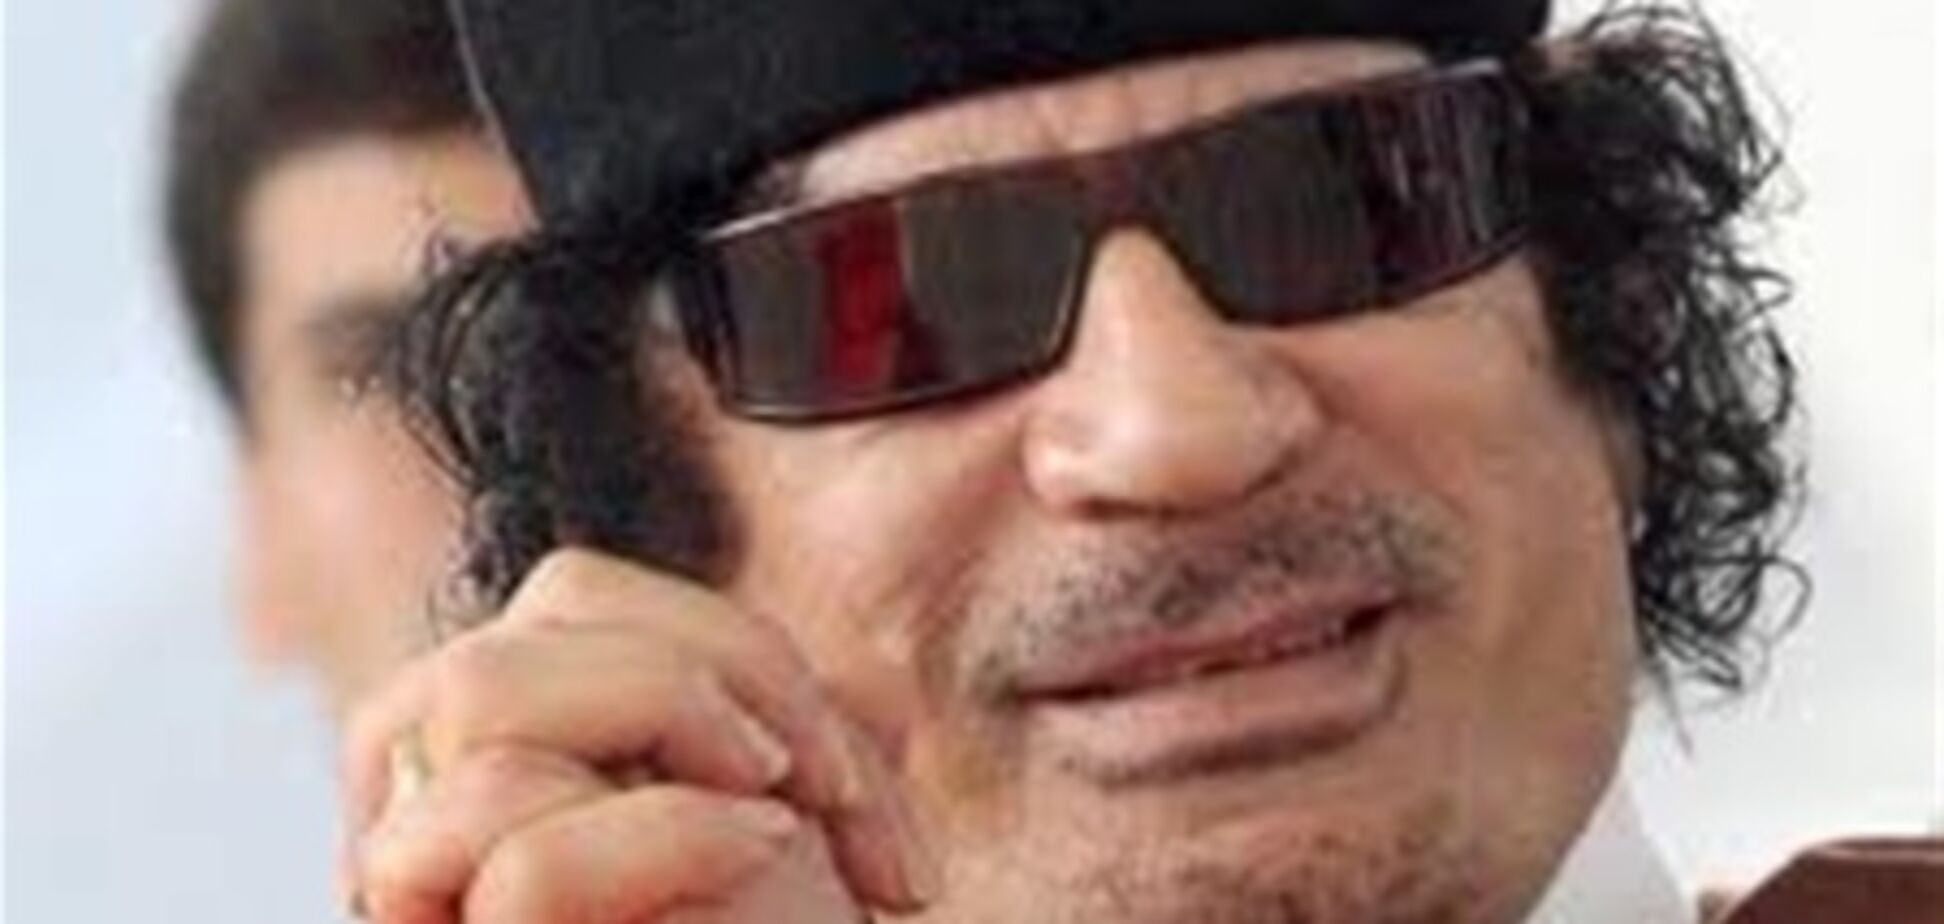 Из речи Каддафи создан убойный танец 'Зенга-зенга'. Видео